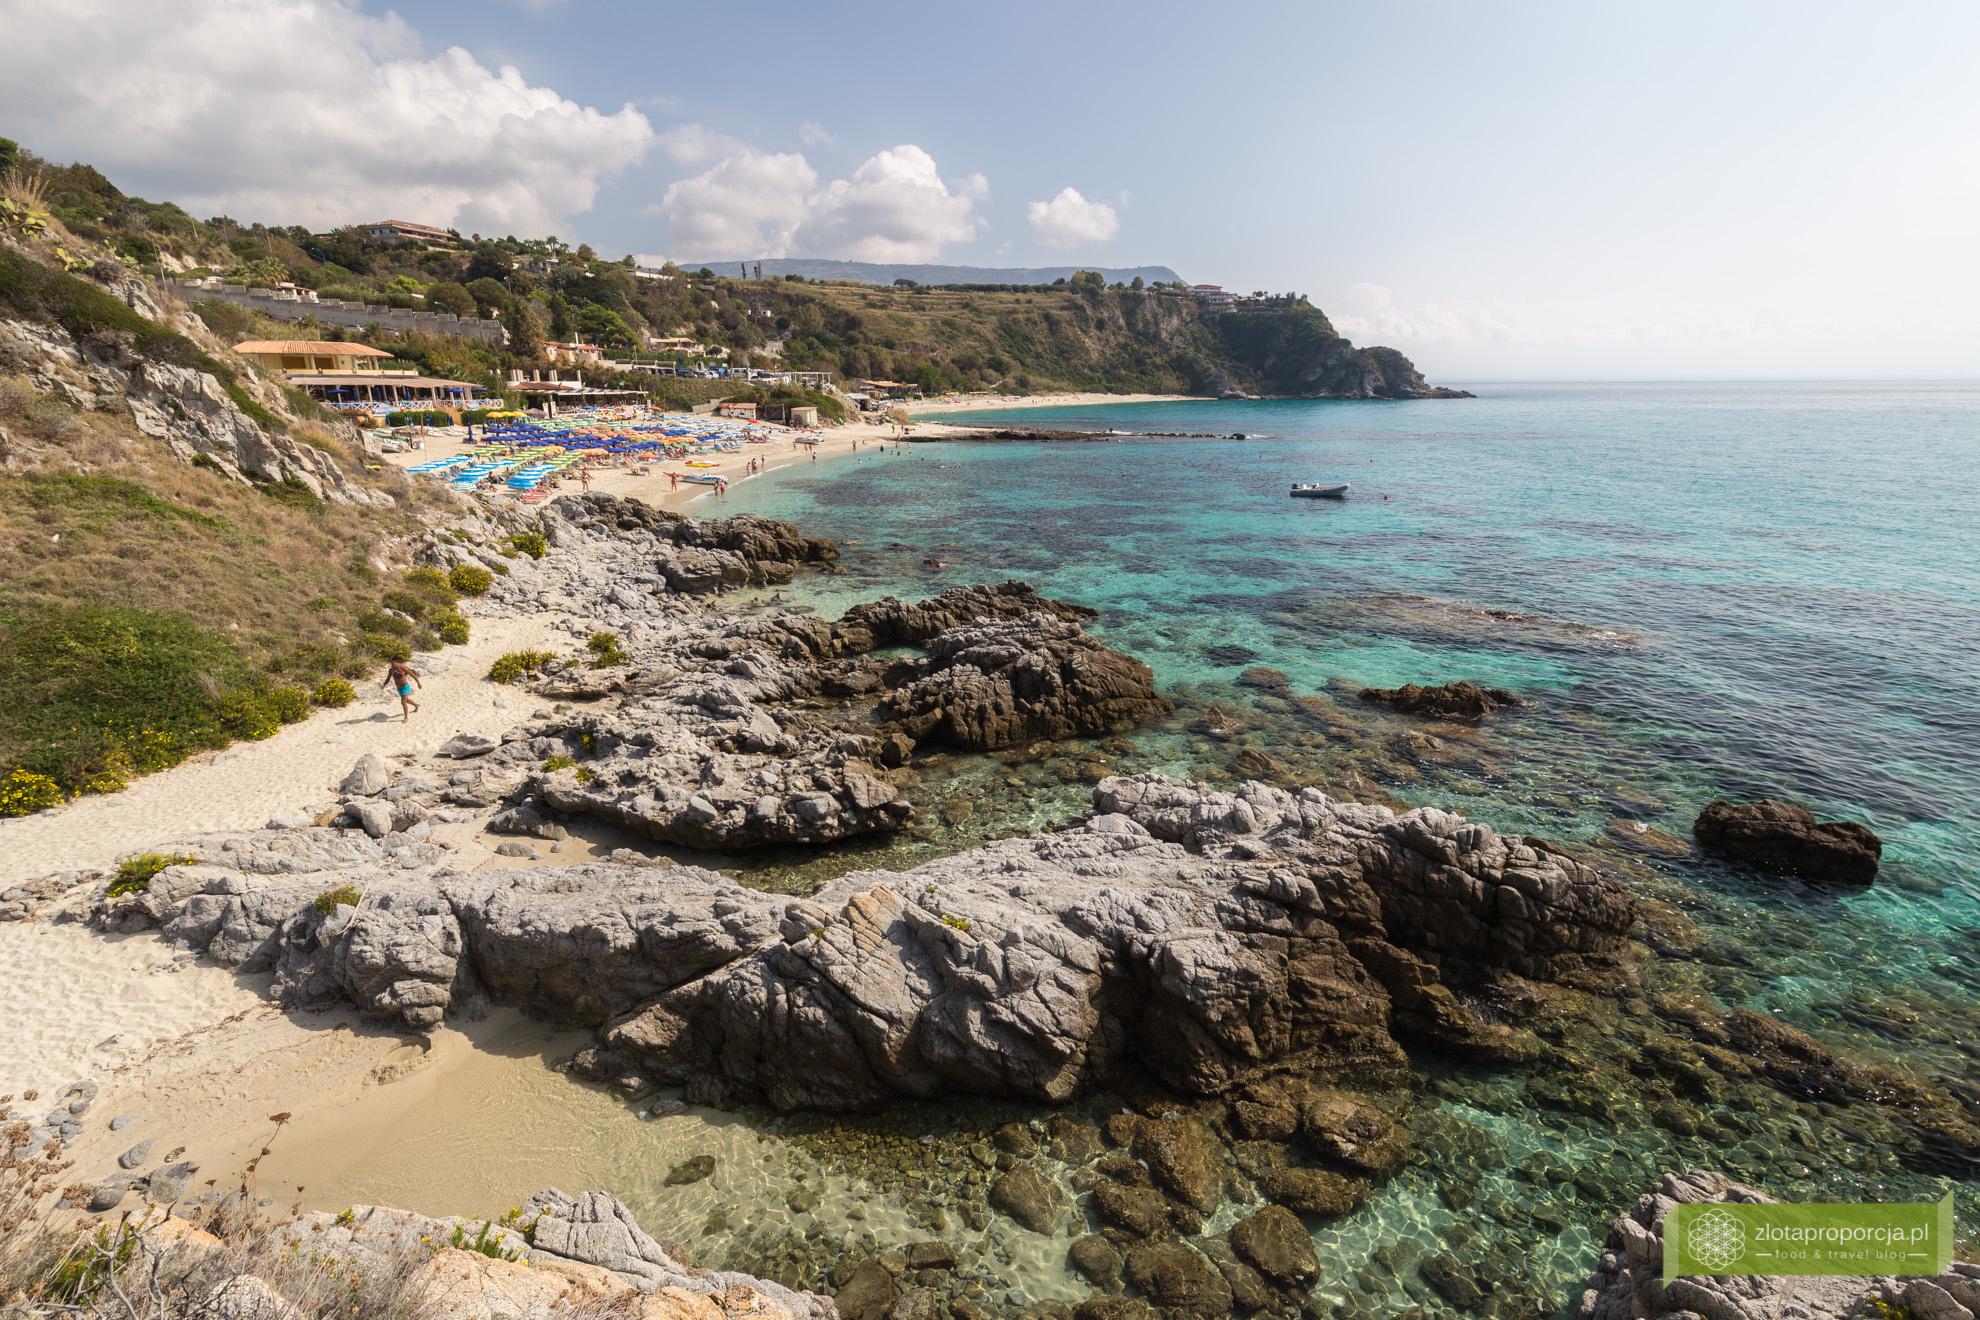 Kalabria, plaże Kalabrii, Capo Vaticano, plaże Capo Vaticano, Plaża Grotticelle